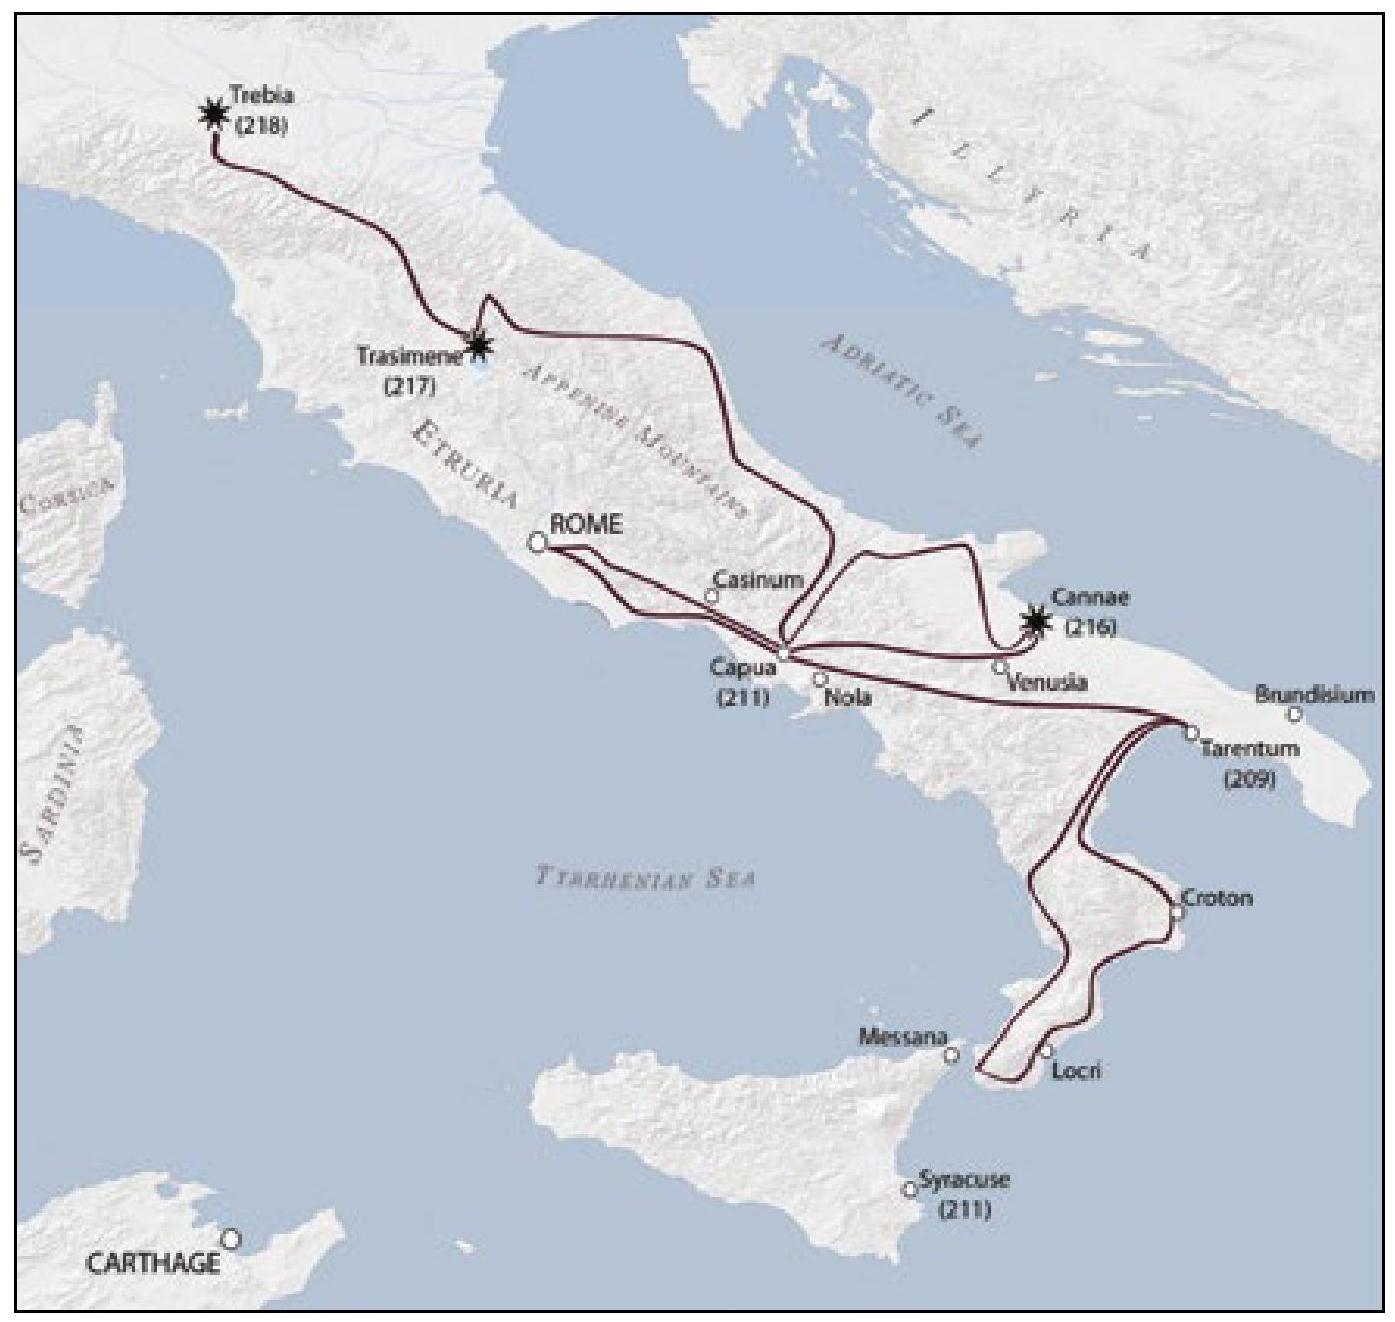 Tarentum Italy Map.Cornelius Nepos Life Of Hannibal 3 Historical Context And